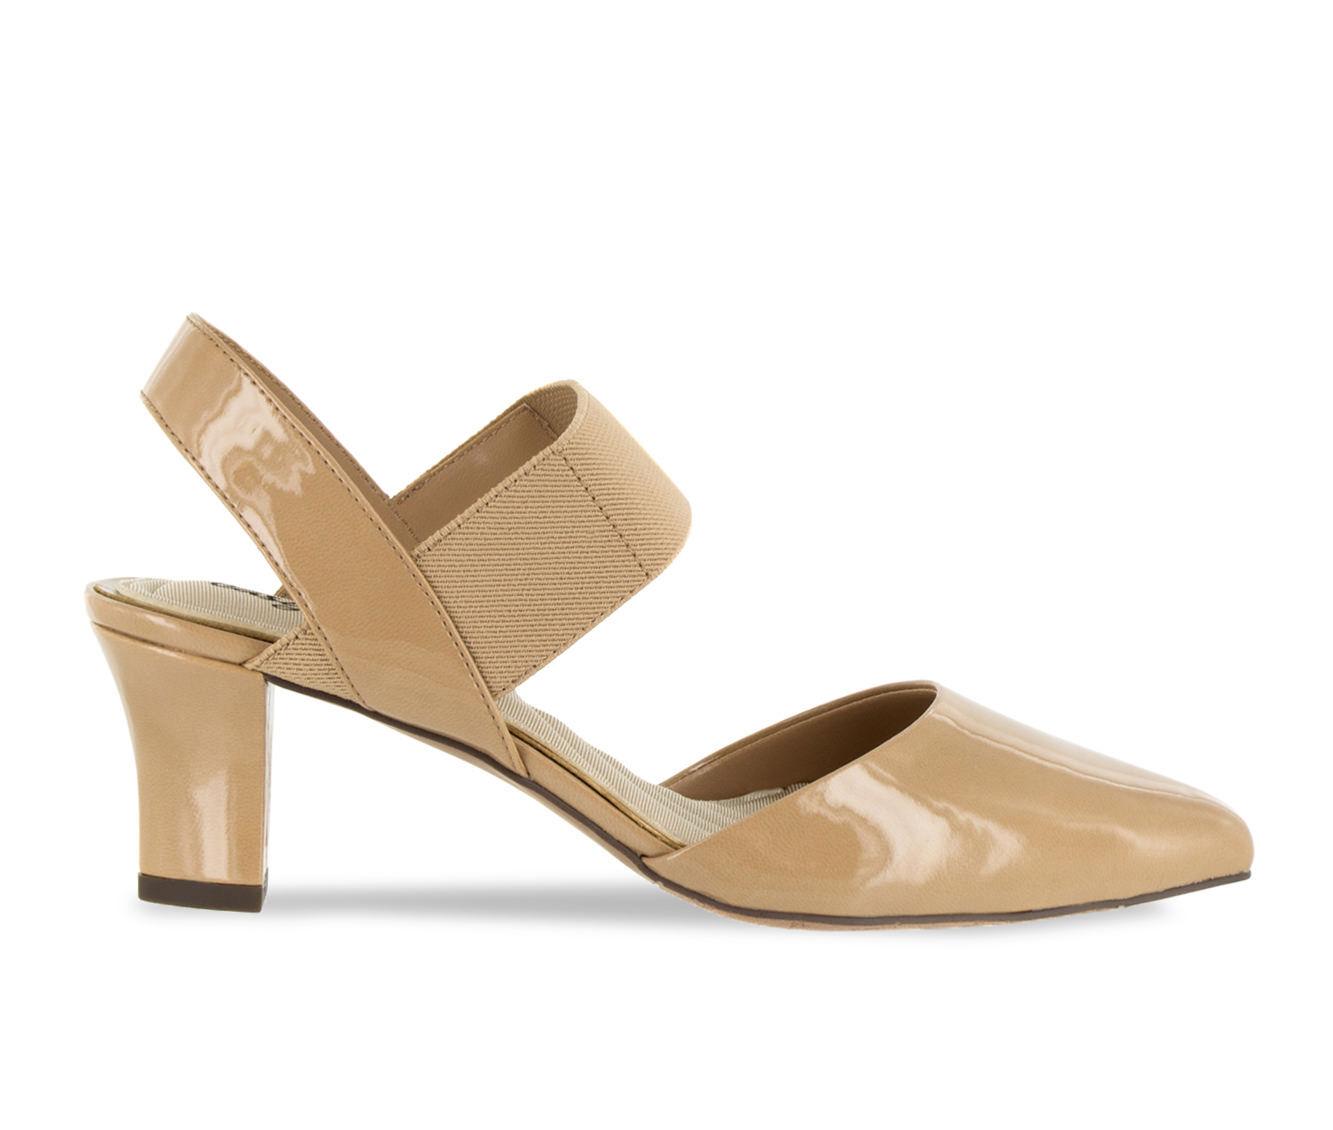 uk shoes_kd6208